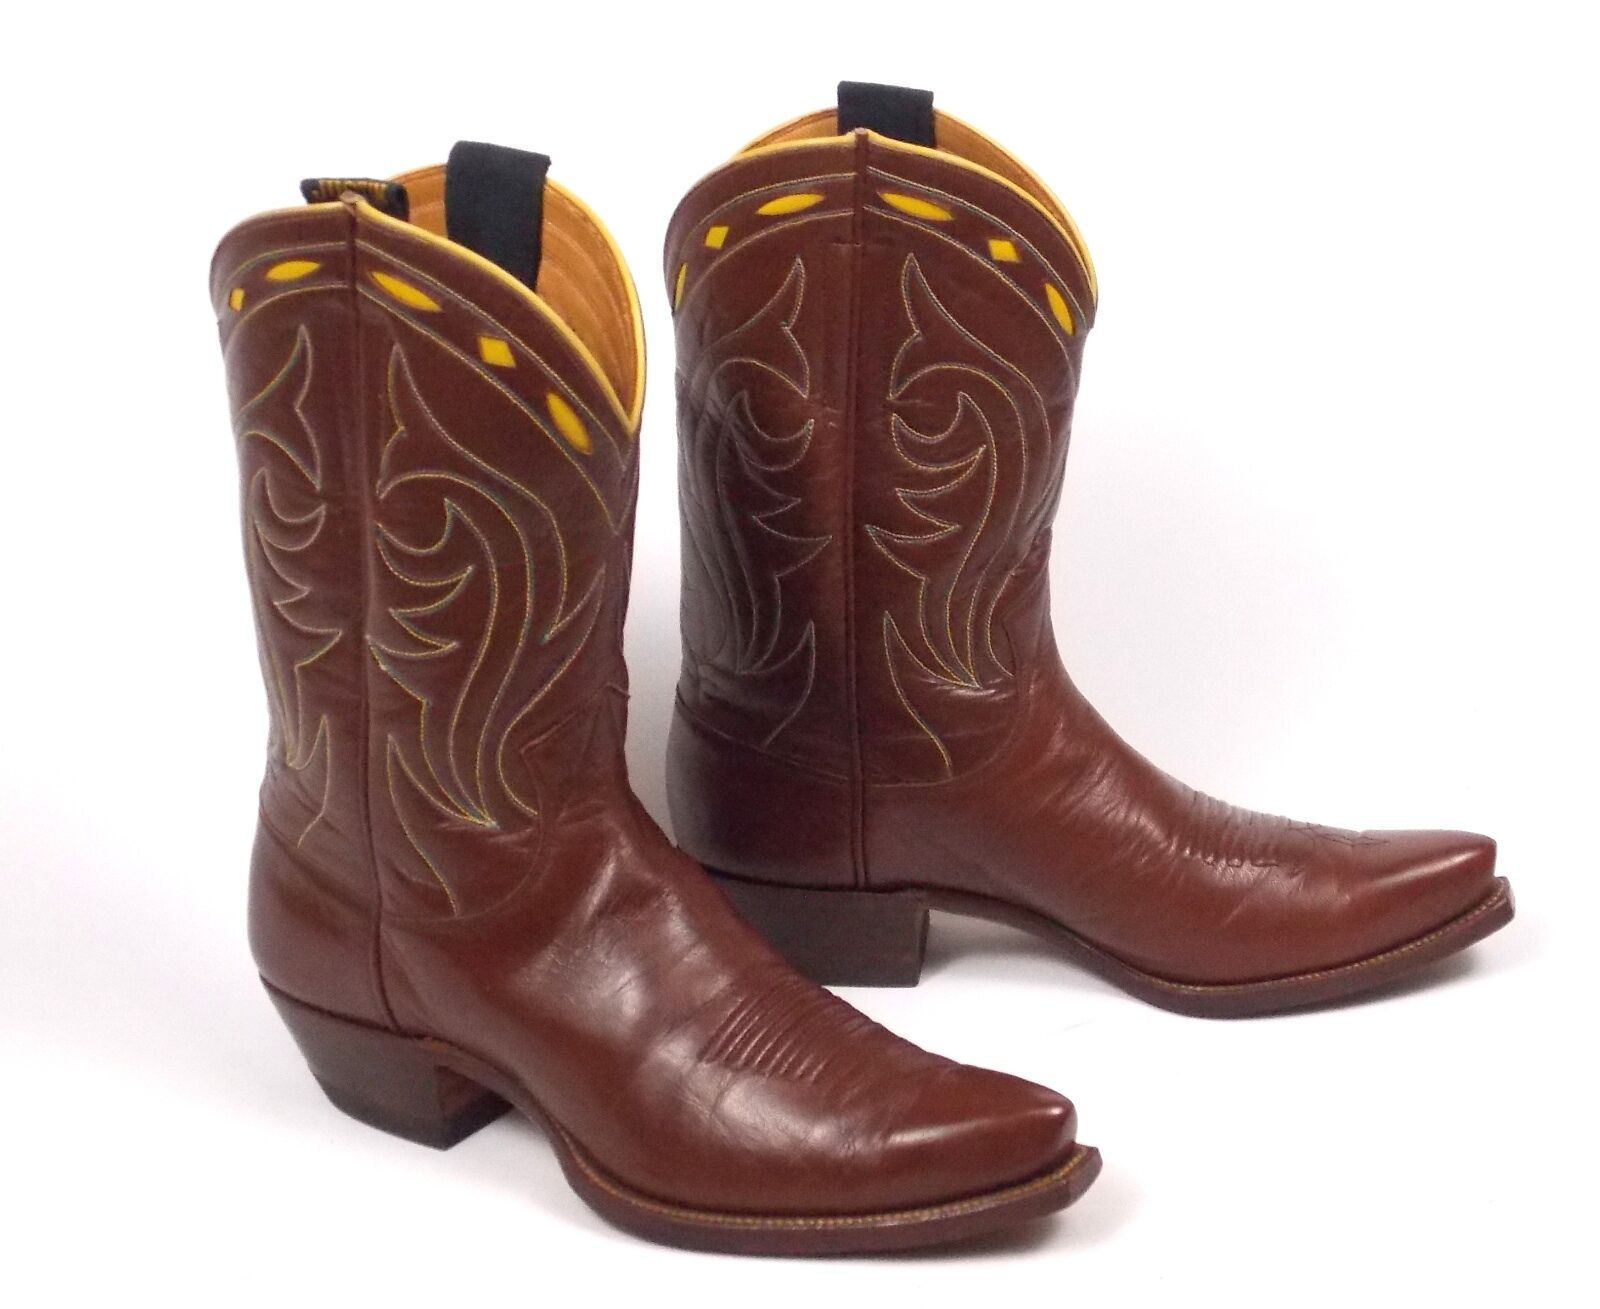 50's Nocona Cowboy stivali -Wmn's 8.5B Vtg Marroneee Shorty Pee Wee Inlaid Cloth Pulls